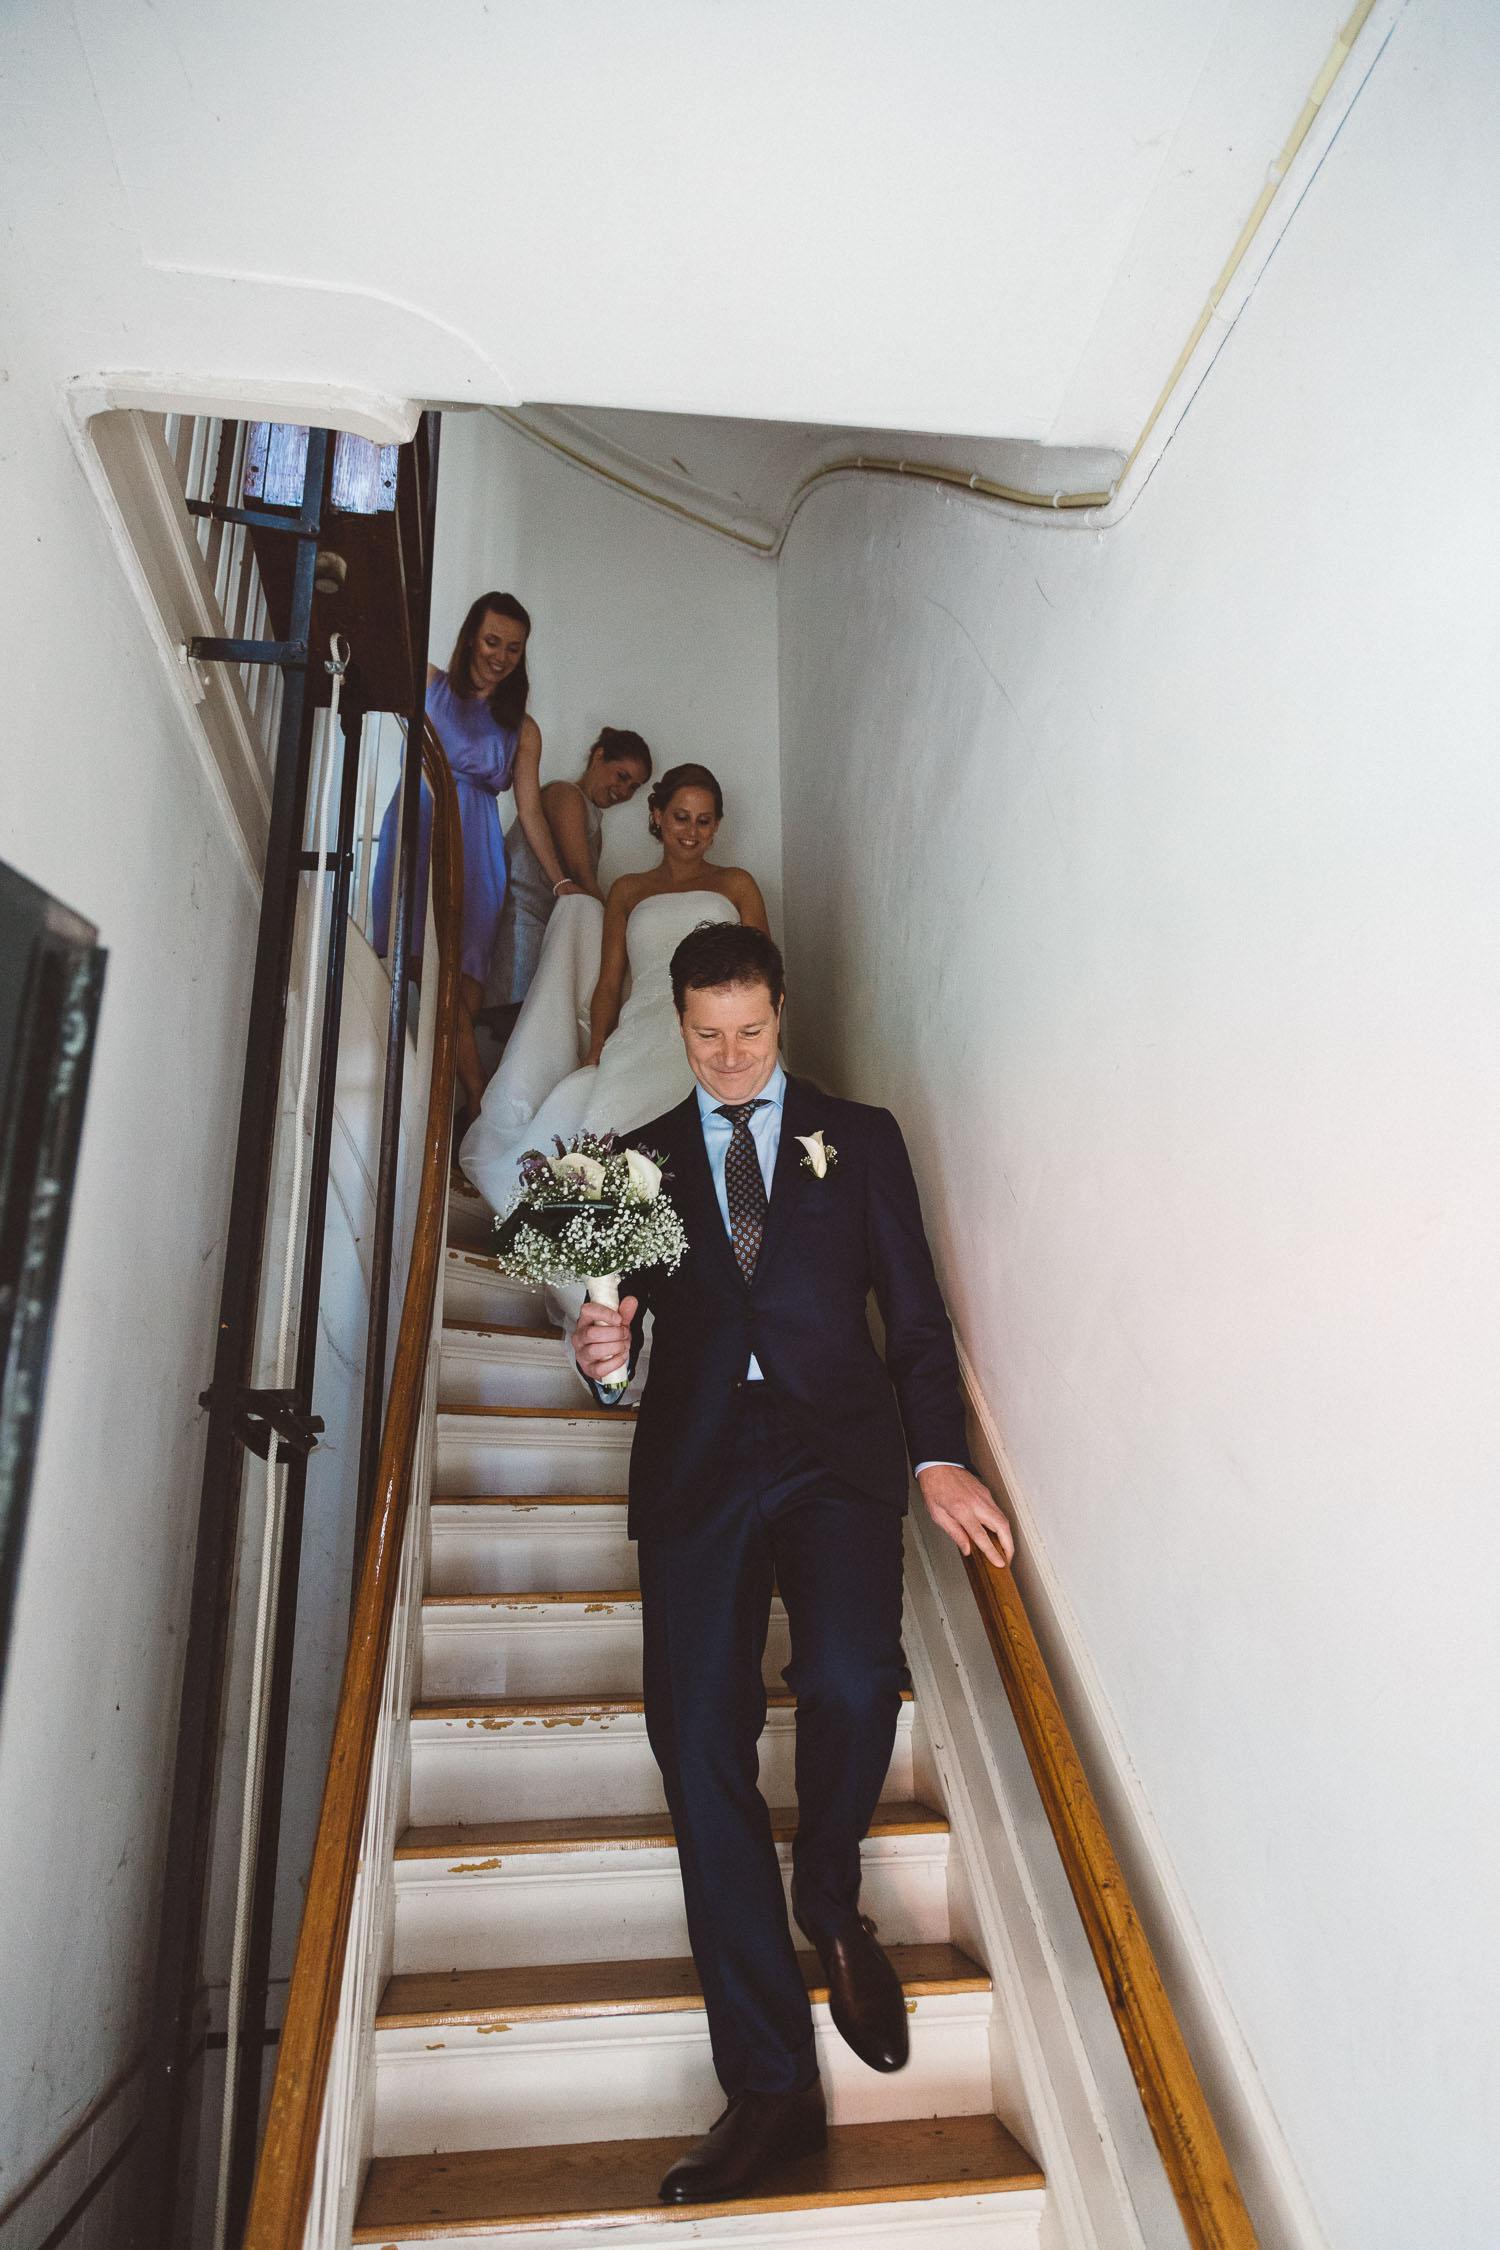 Wedding-huwelijk-trouwen-bruiloft-photography-fotografie-fotograaf-photographer-Rijksmuseum-College-Hotel-On-a-hazy-morning-Amsterdam-The-Netherlands-58.jpg